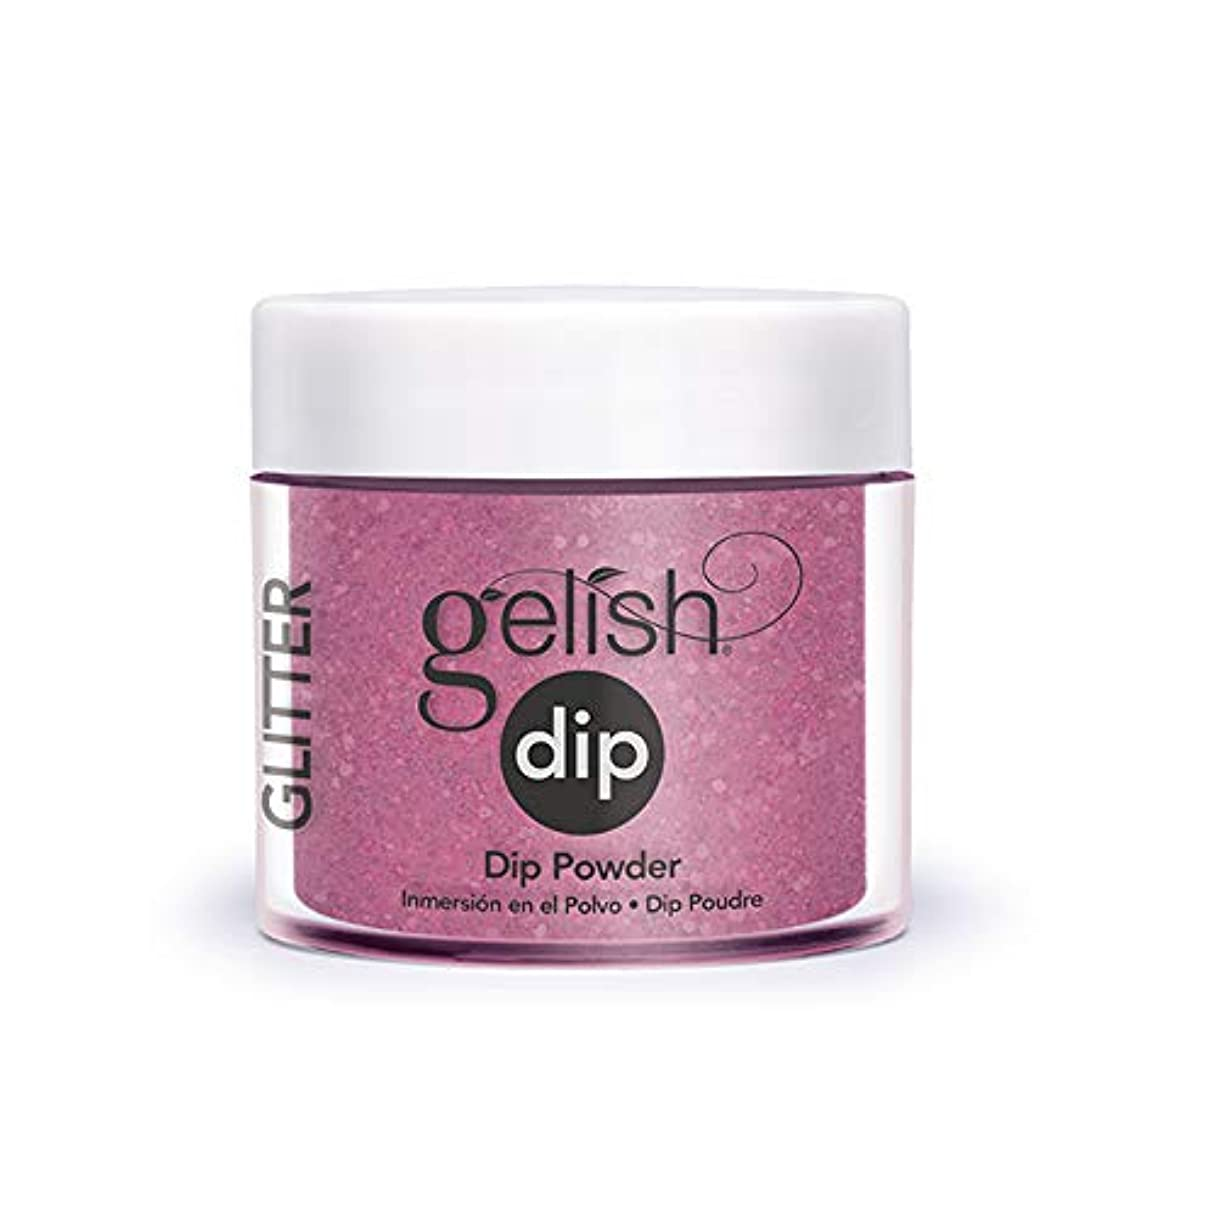 協力的脚本家銀行Harmony Gelish - Acrylic Dip Powder - Too Tough to be Sweet - 23g / 0.8oz